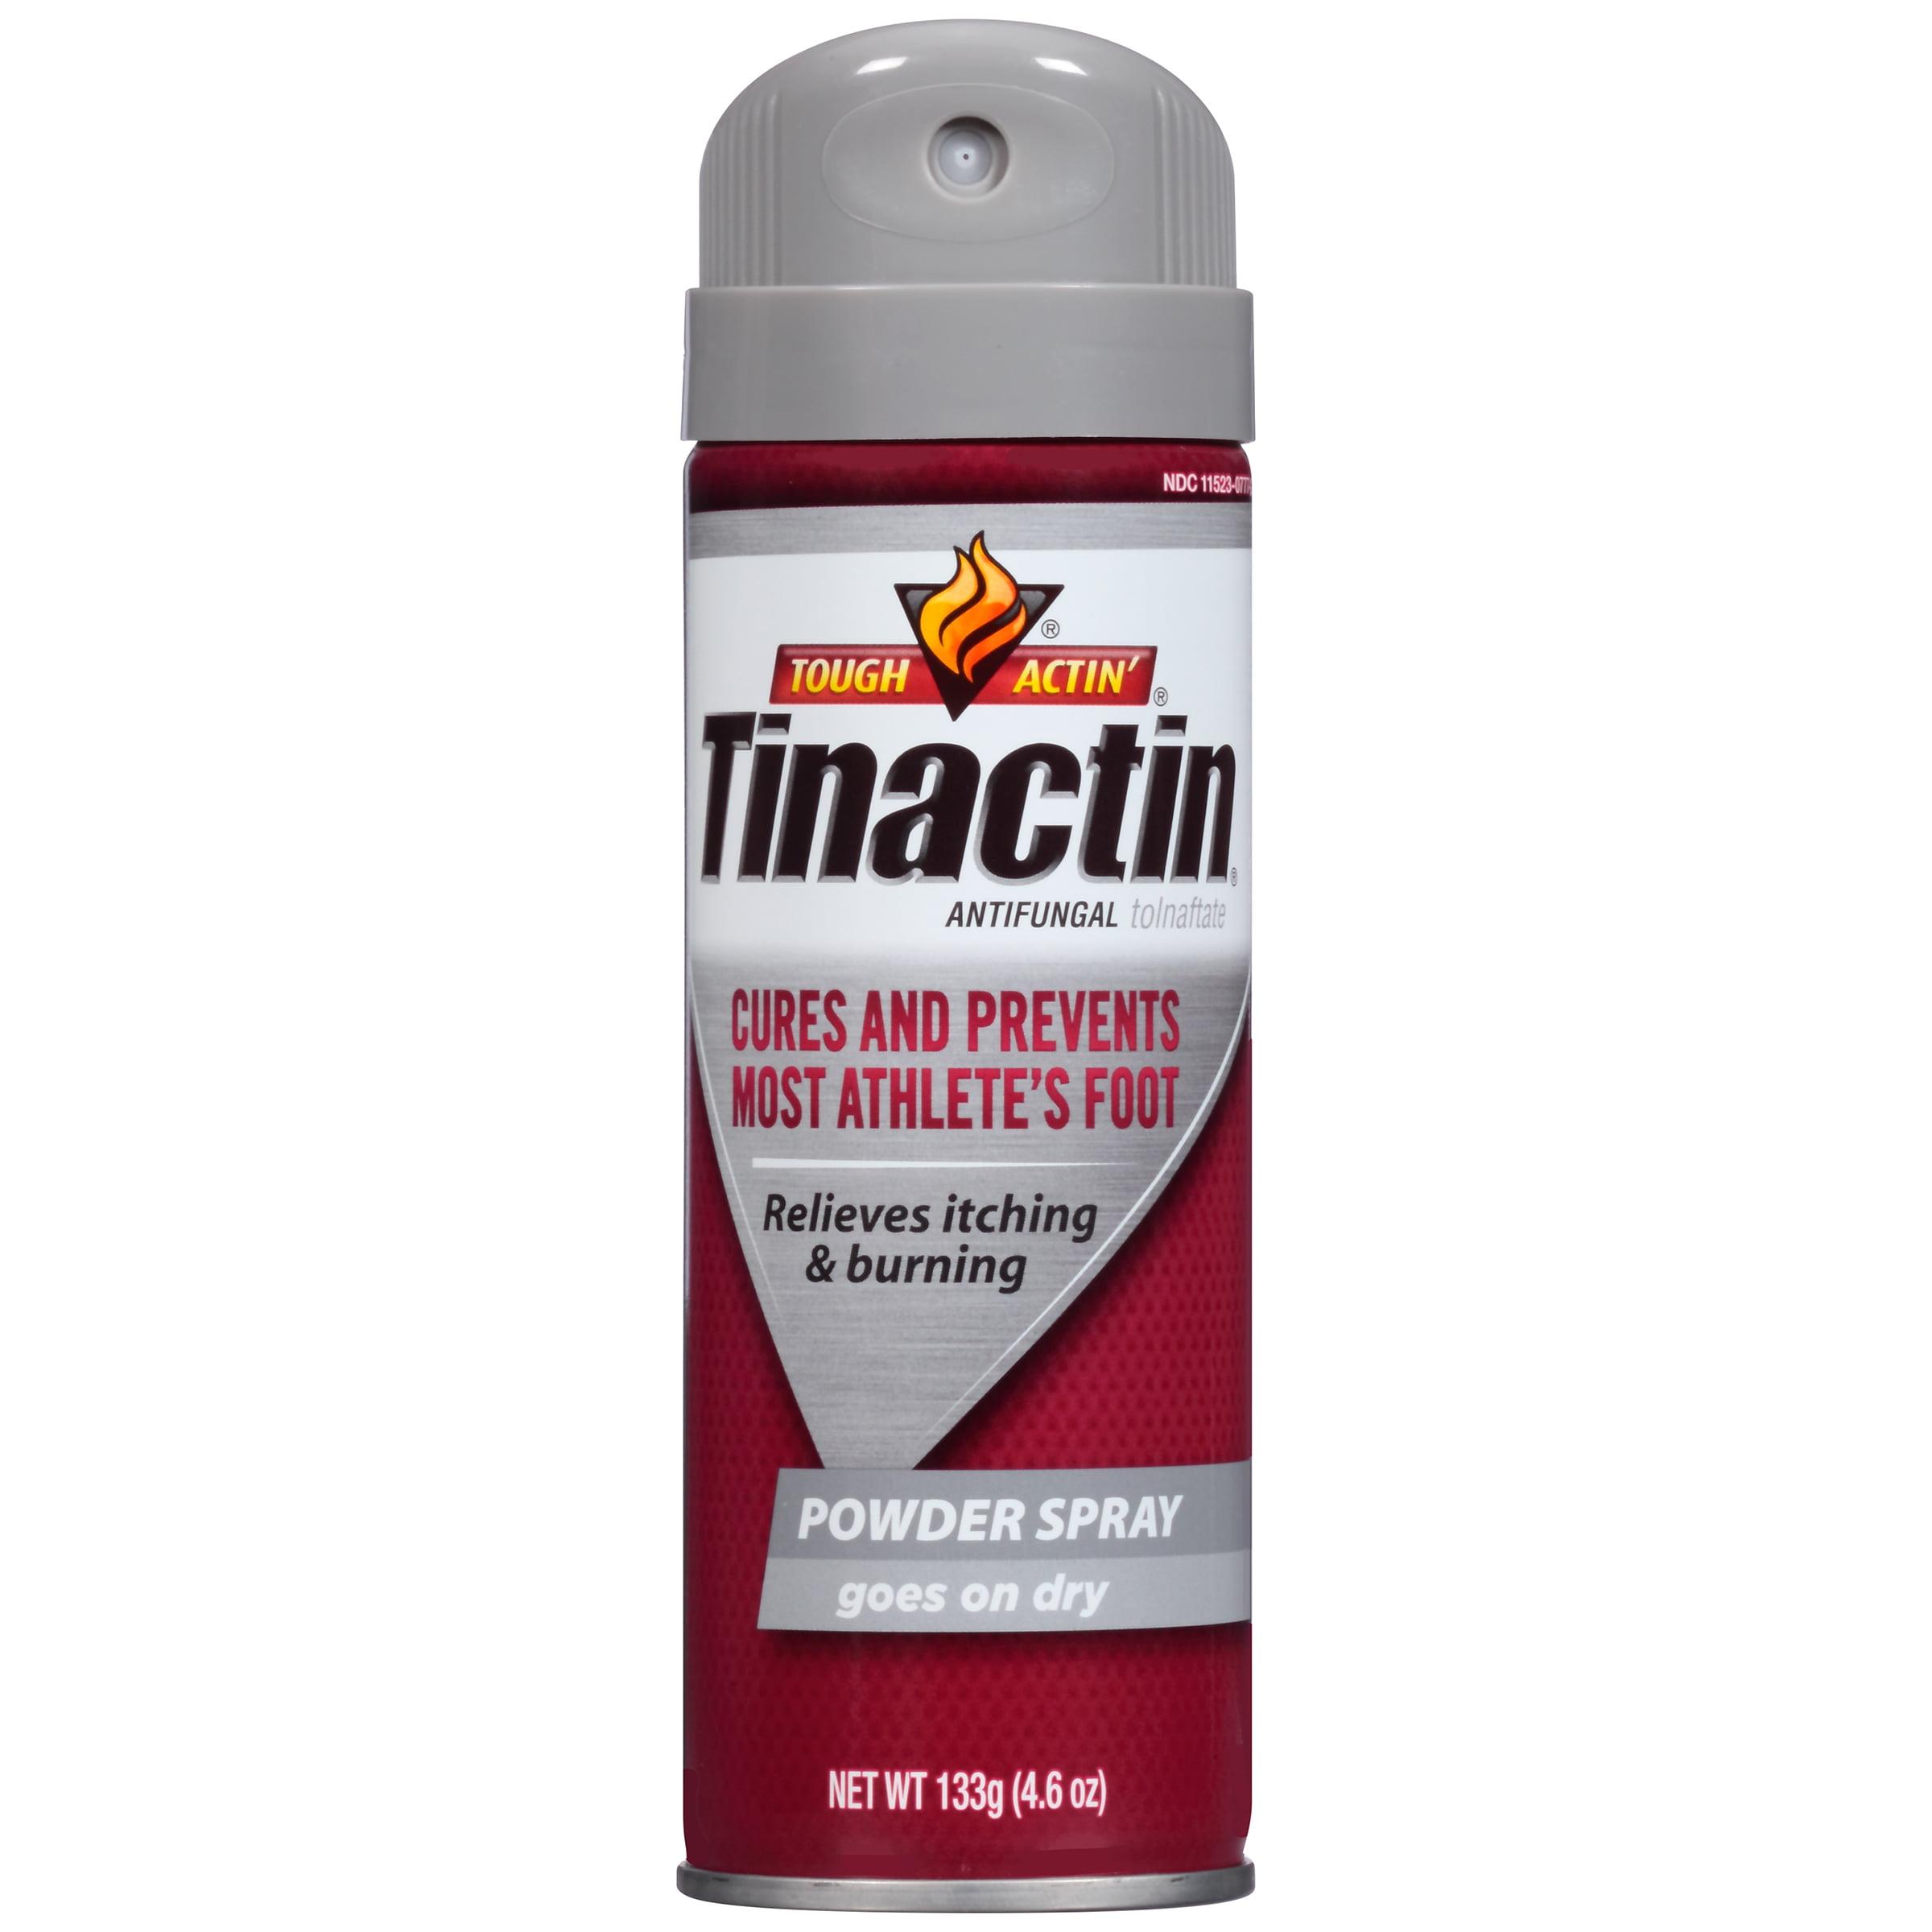 2 Pack Tinactin Tolnaftate Antifungal Athlete's Foot Powder Spray 4.6 Ounce Each